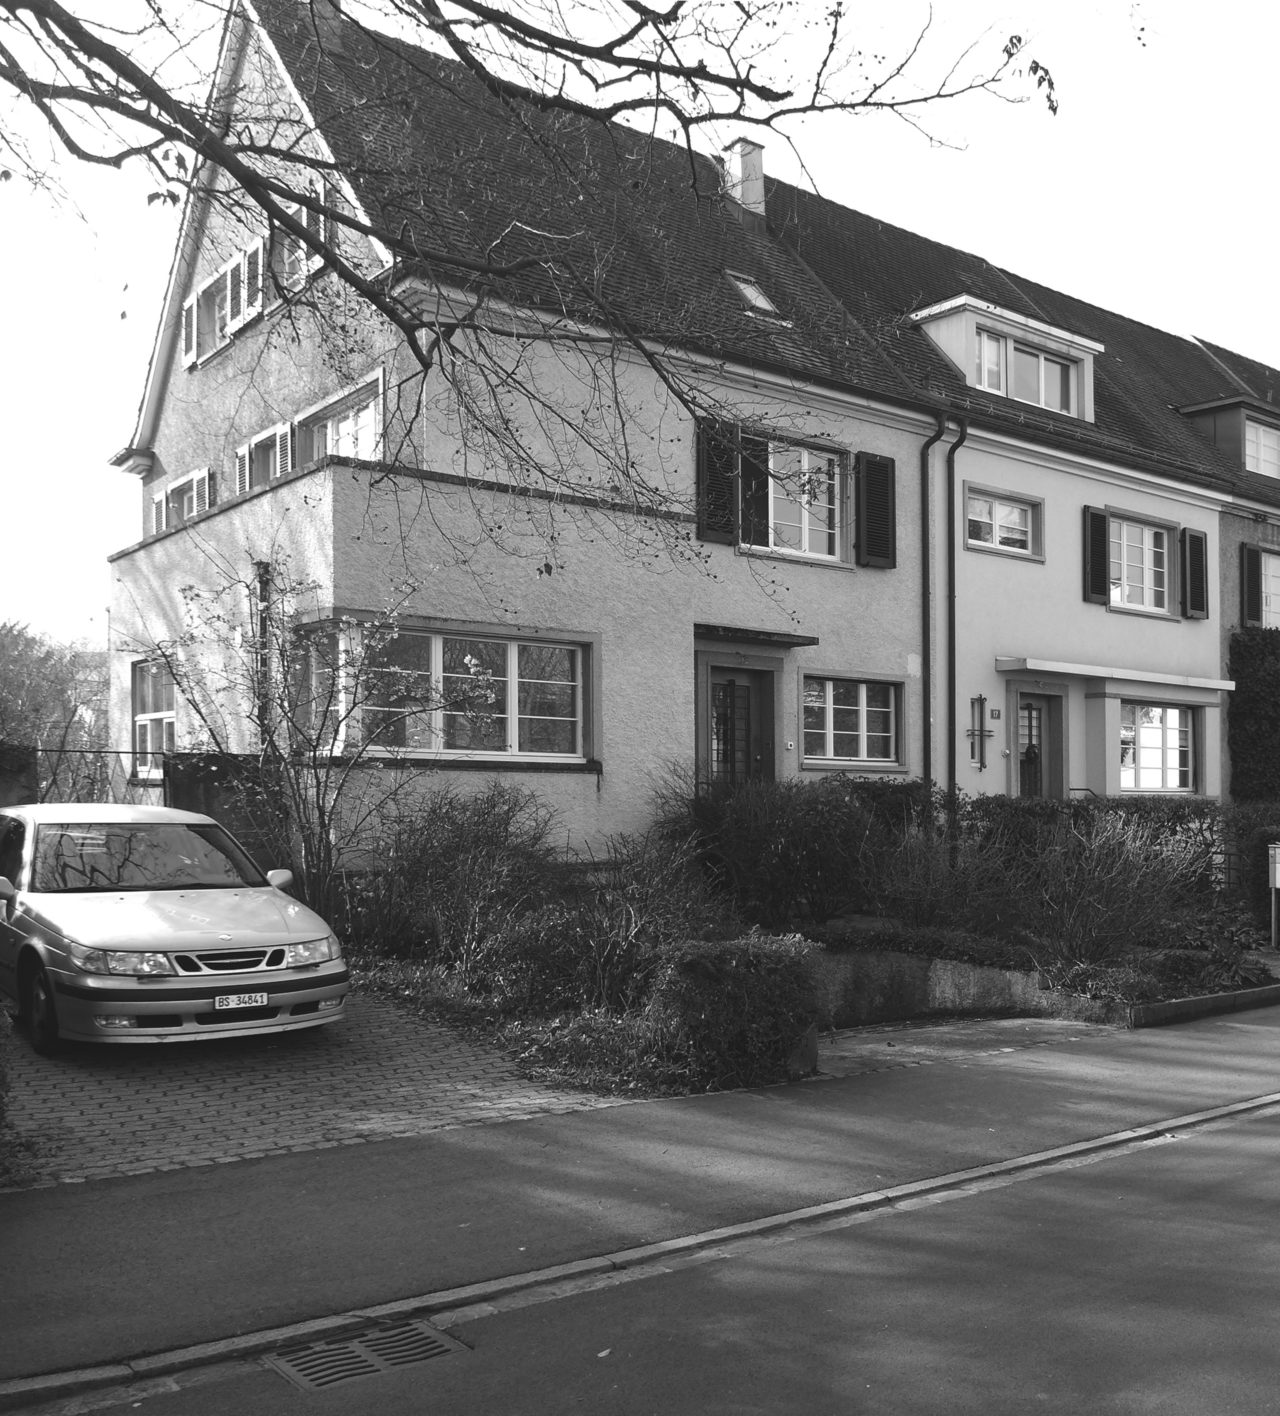 Strassenansicht nach Renovation von Architekturbüro Forsberg in Basel